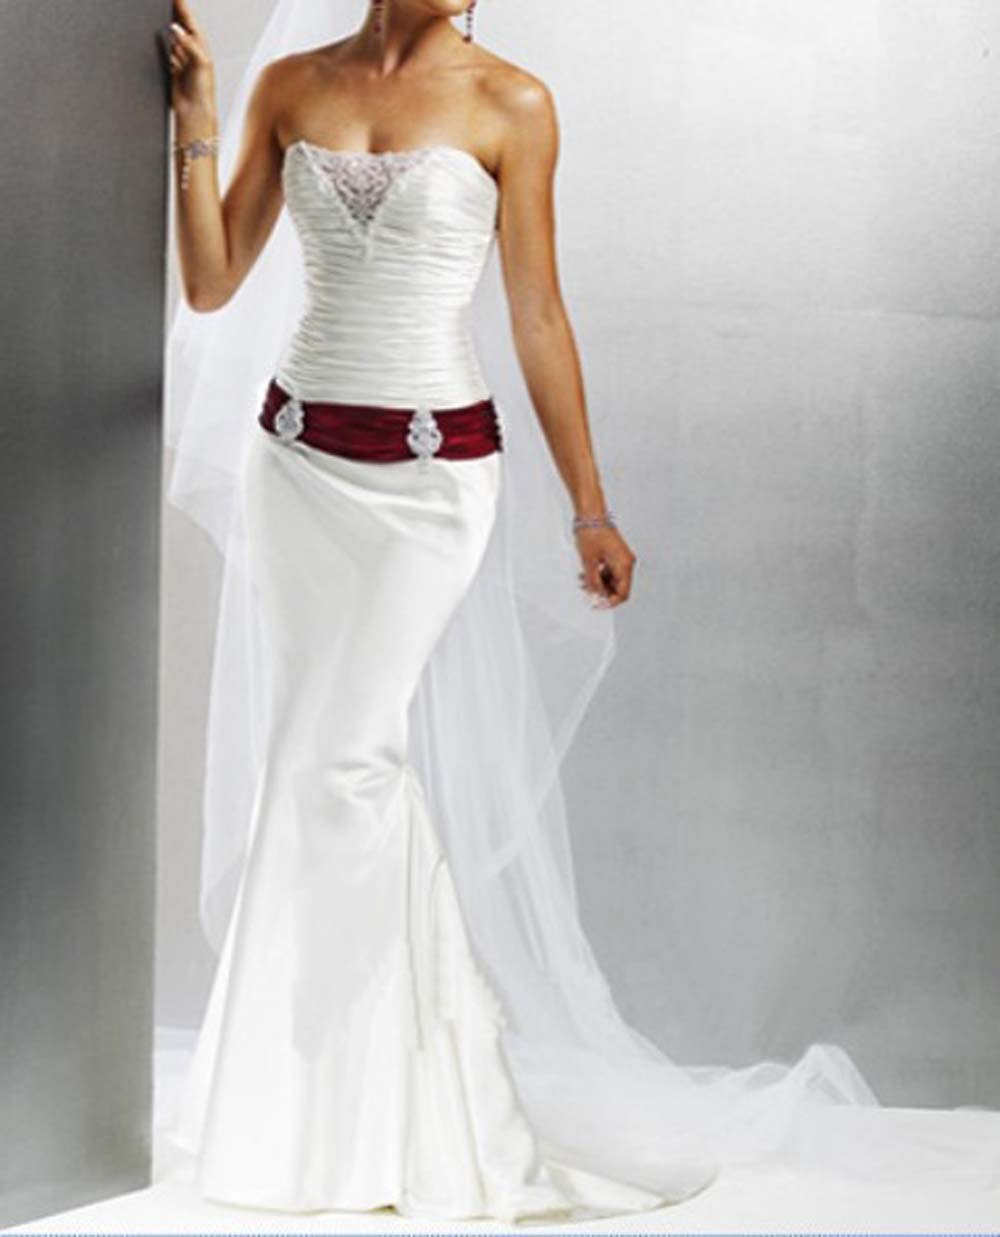 Western Wedding Dress Sewing Patterns